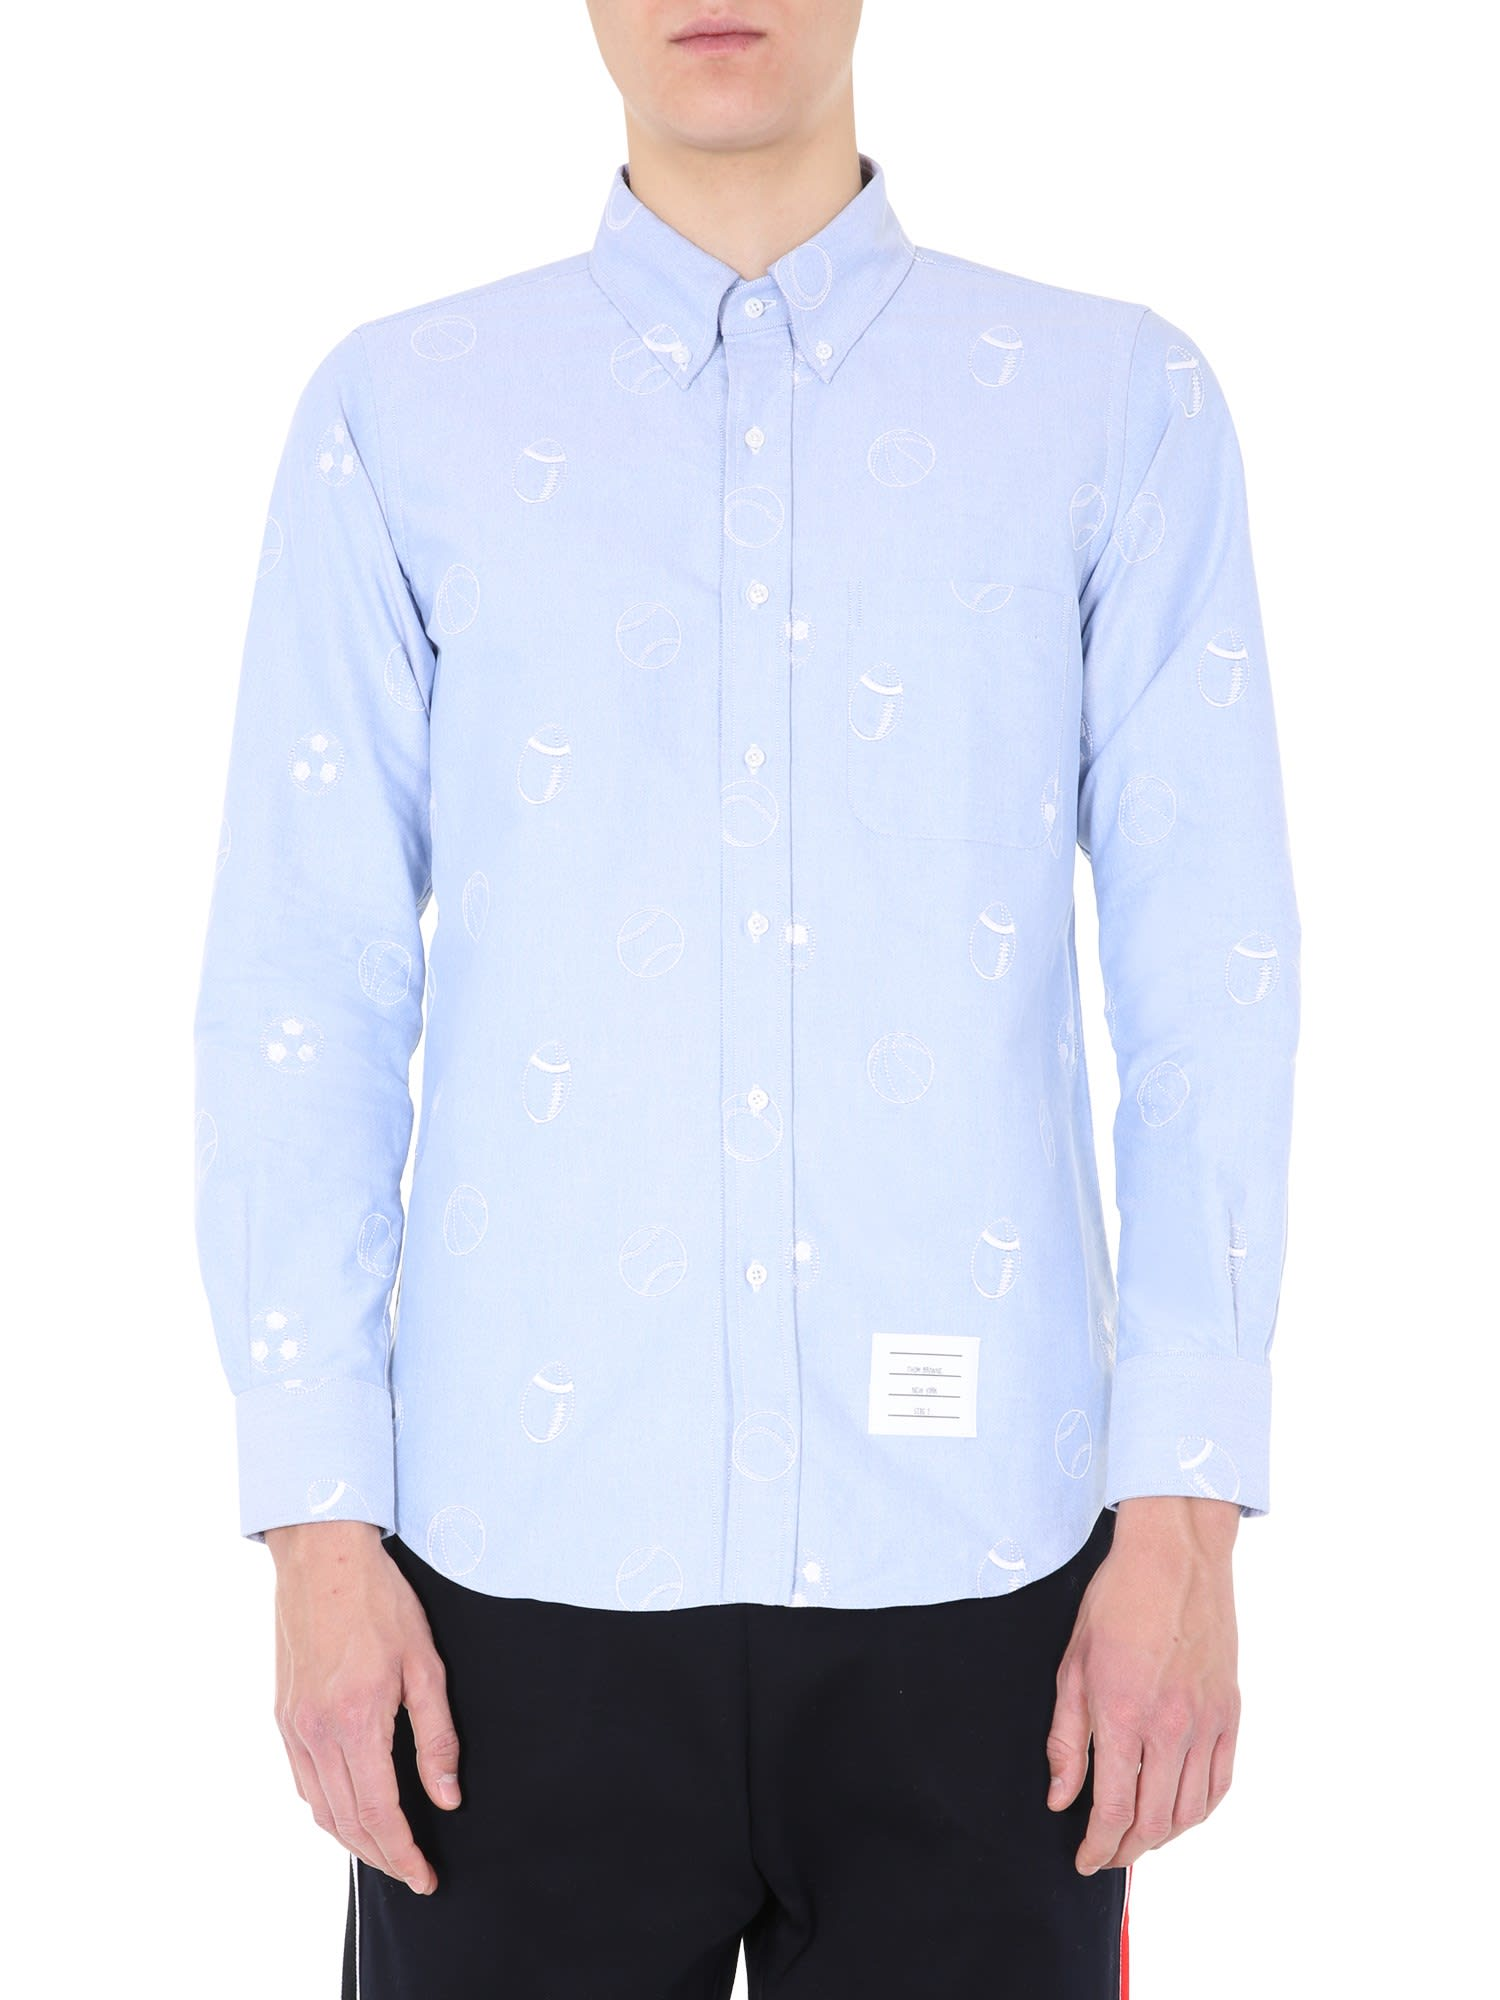 Thom Browne Long Sleeved Shirt